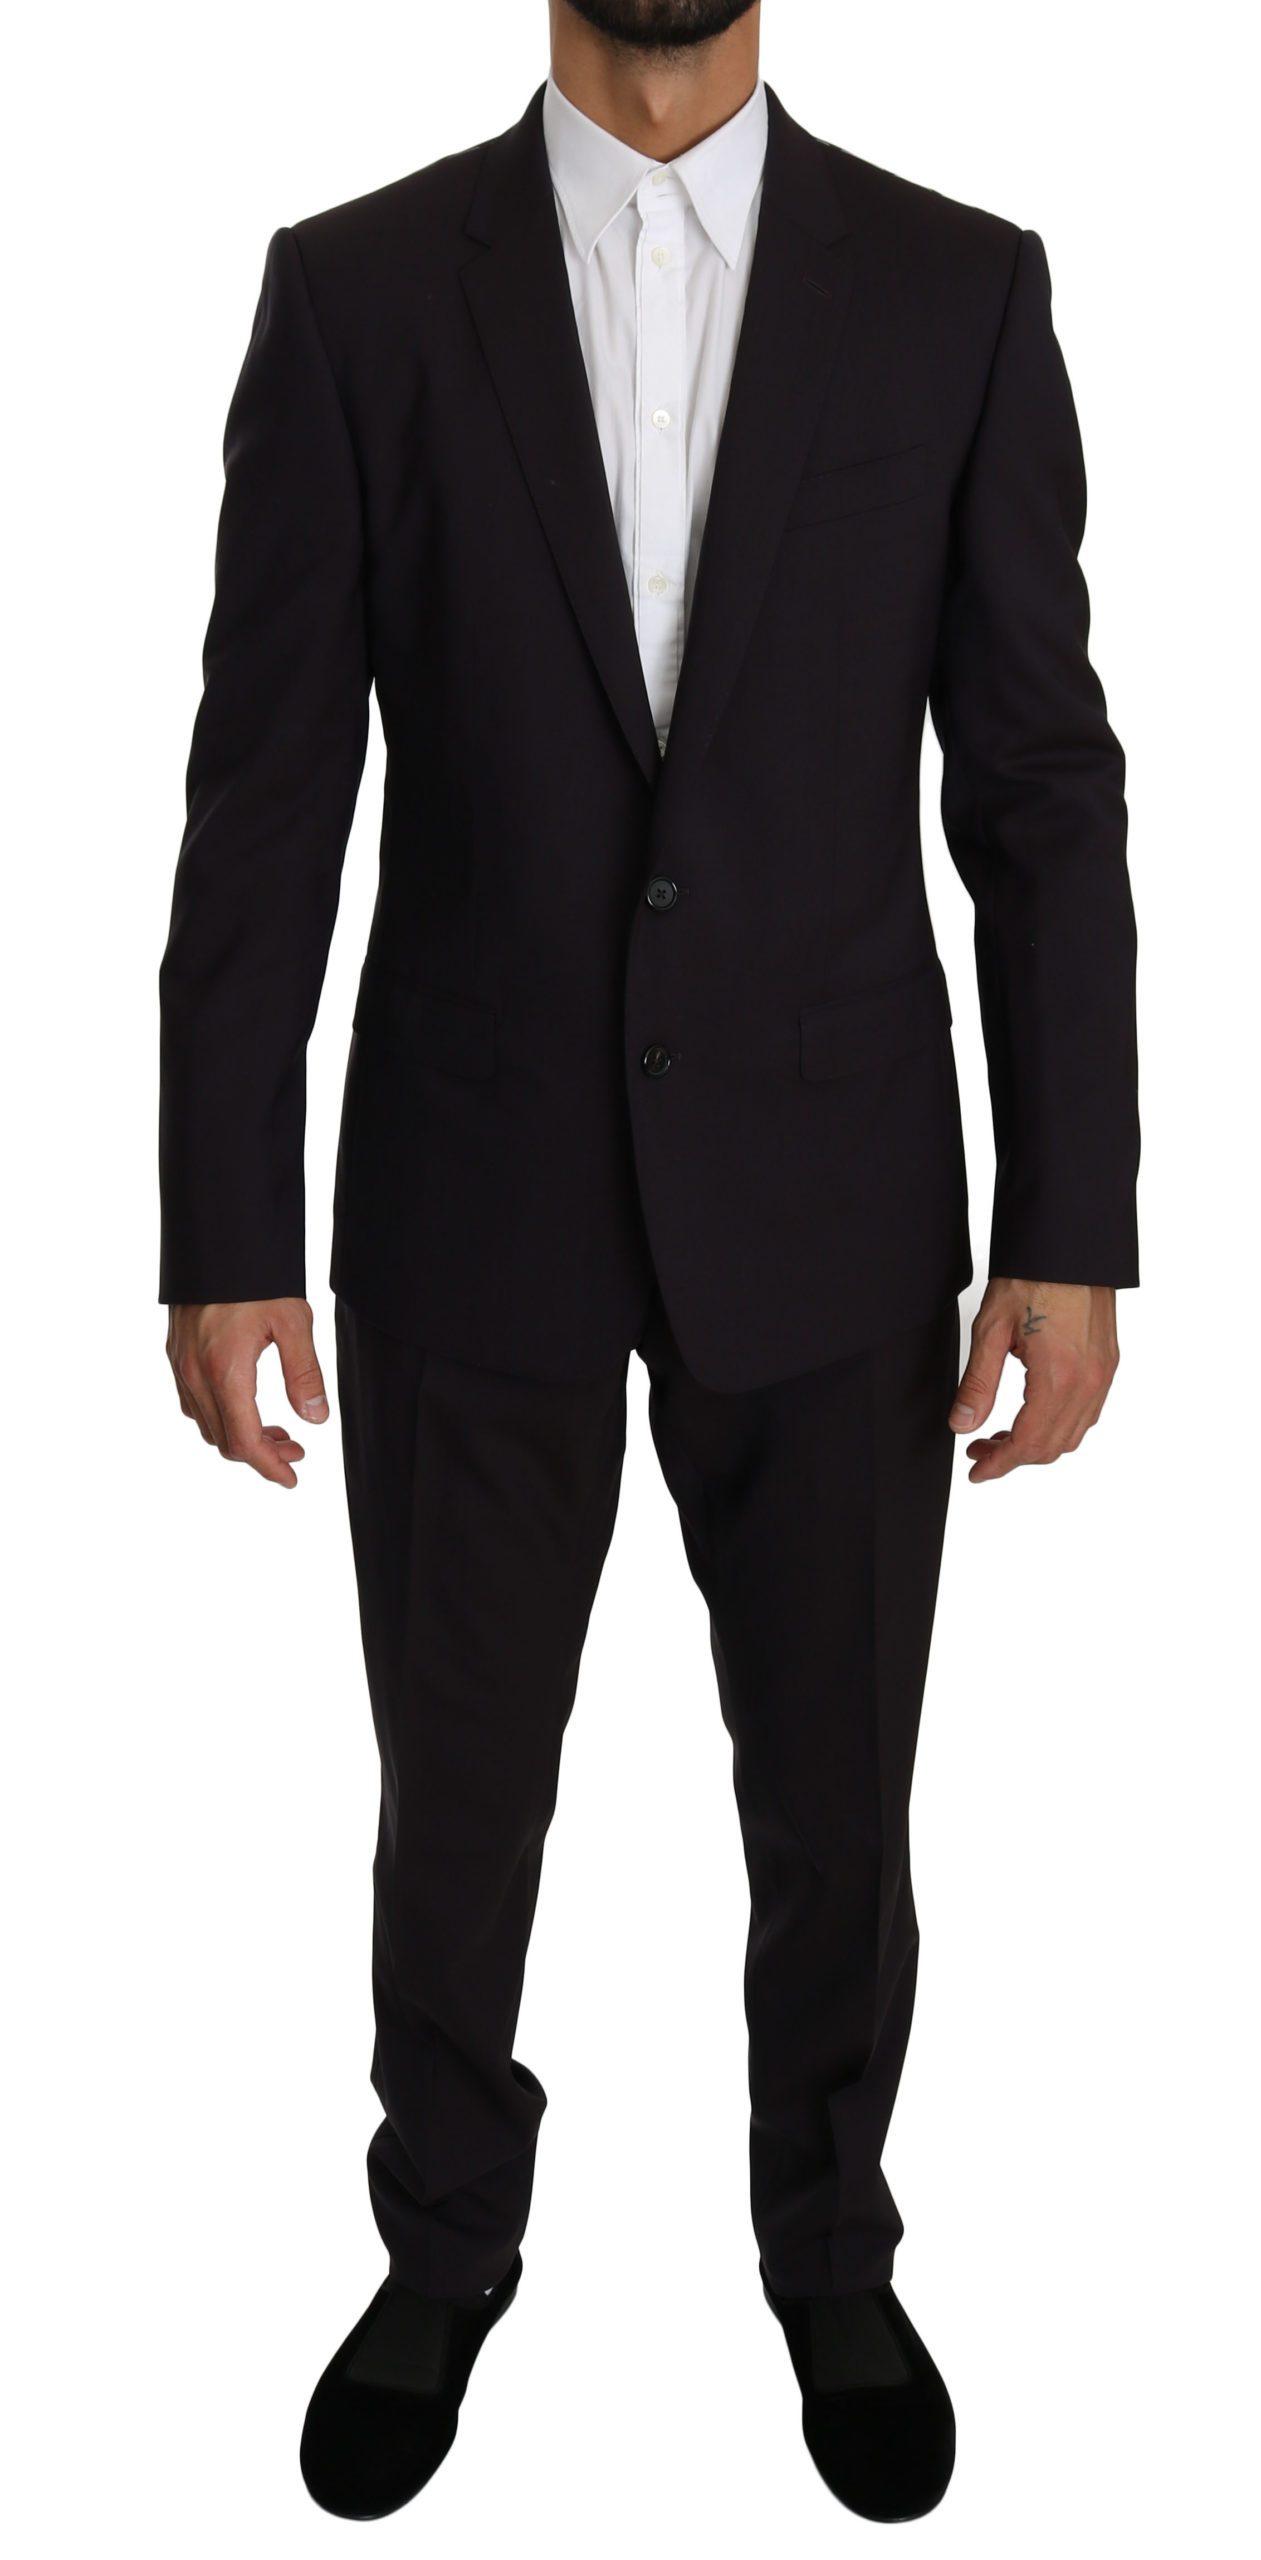 Dolce & Gabbana Men's Wool Stretch 2 Piece MARTINI Suit Purple KOS1606 - IT50 | L